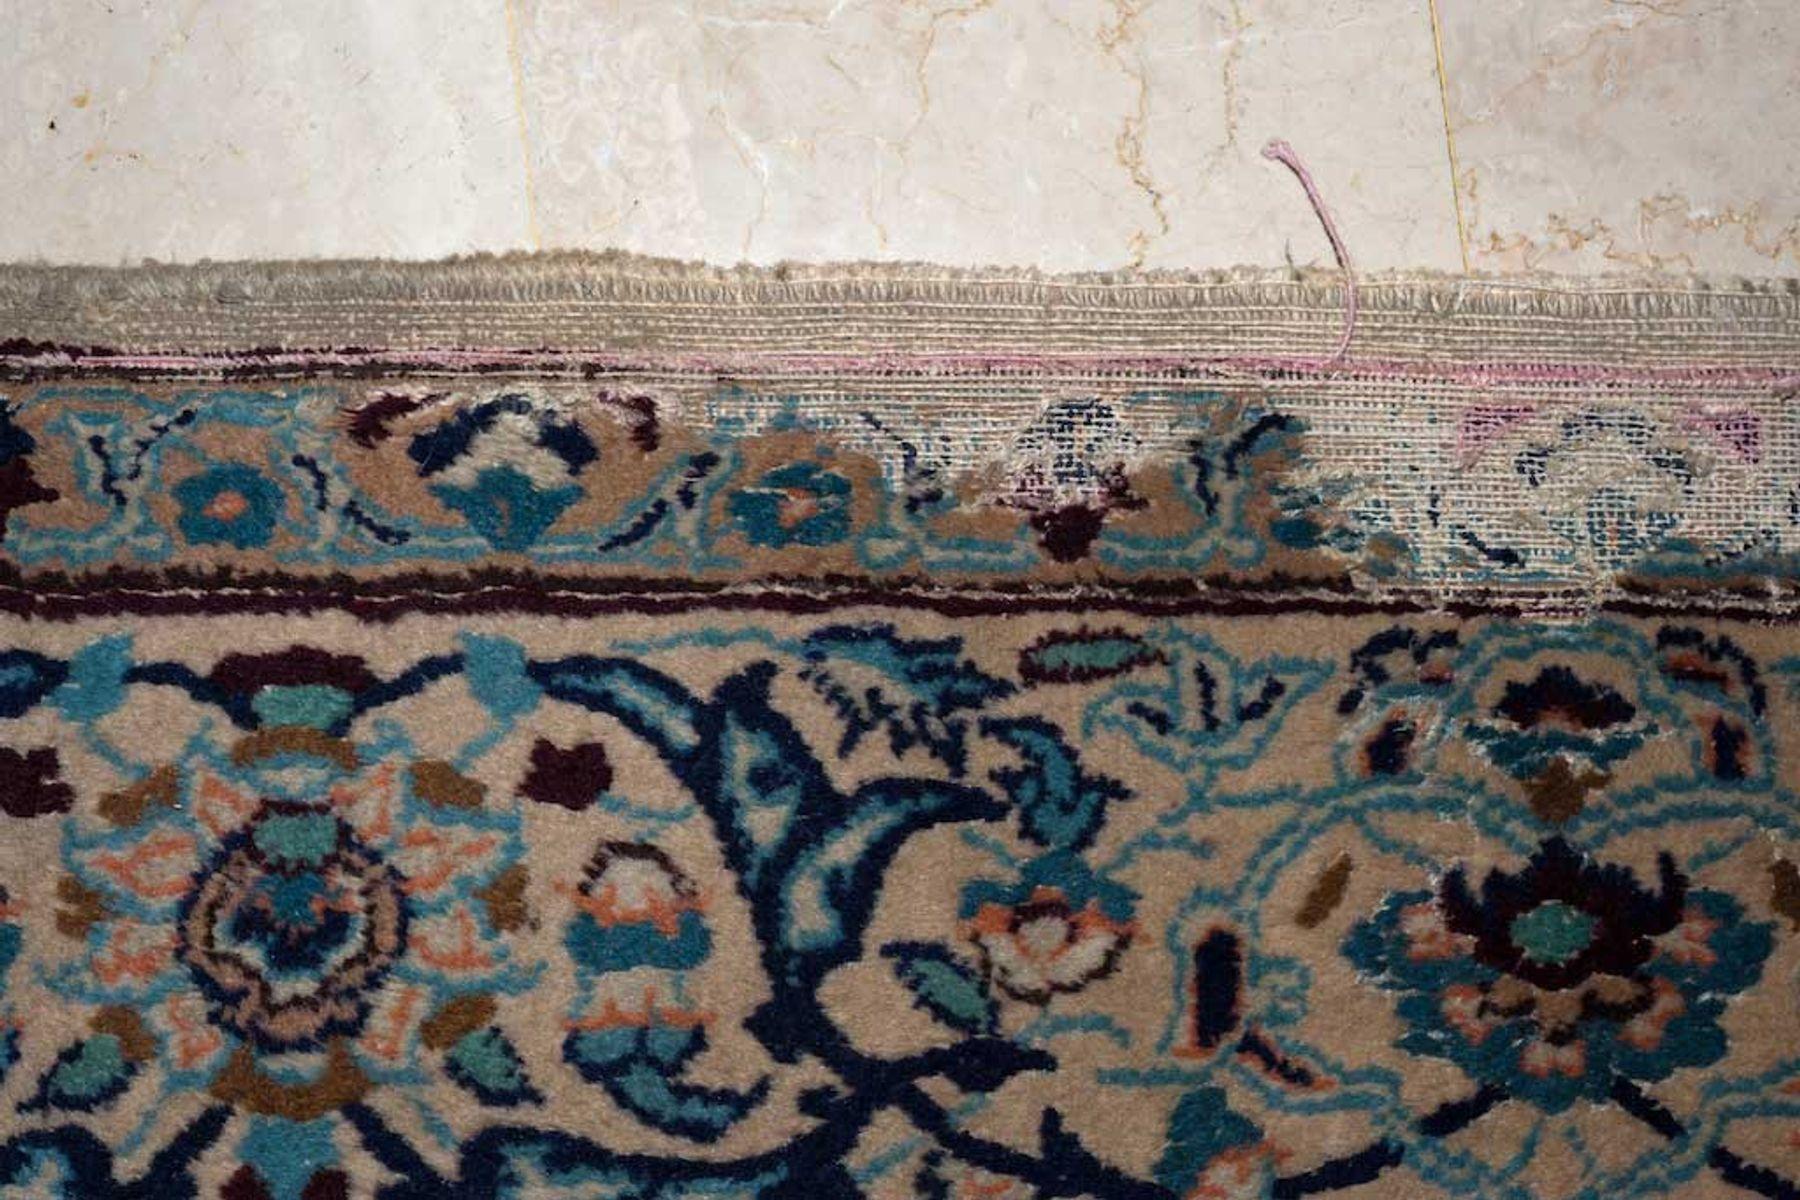 A moth eaten carpet on a stone floor